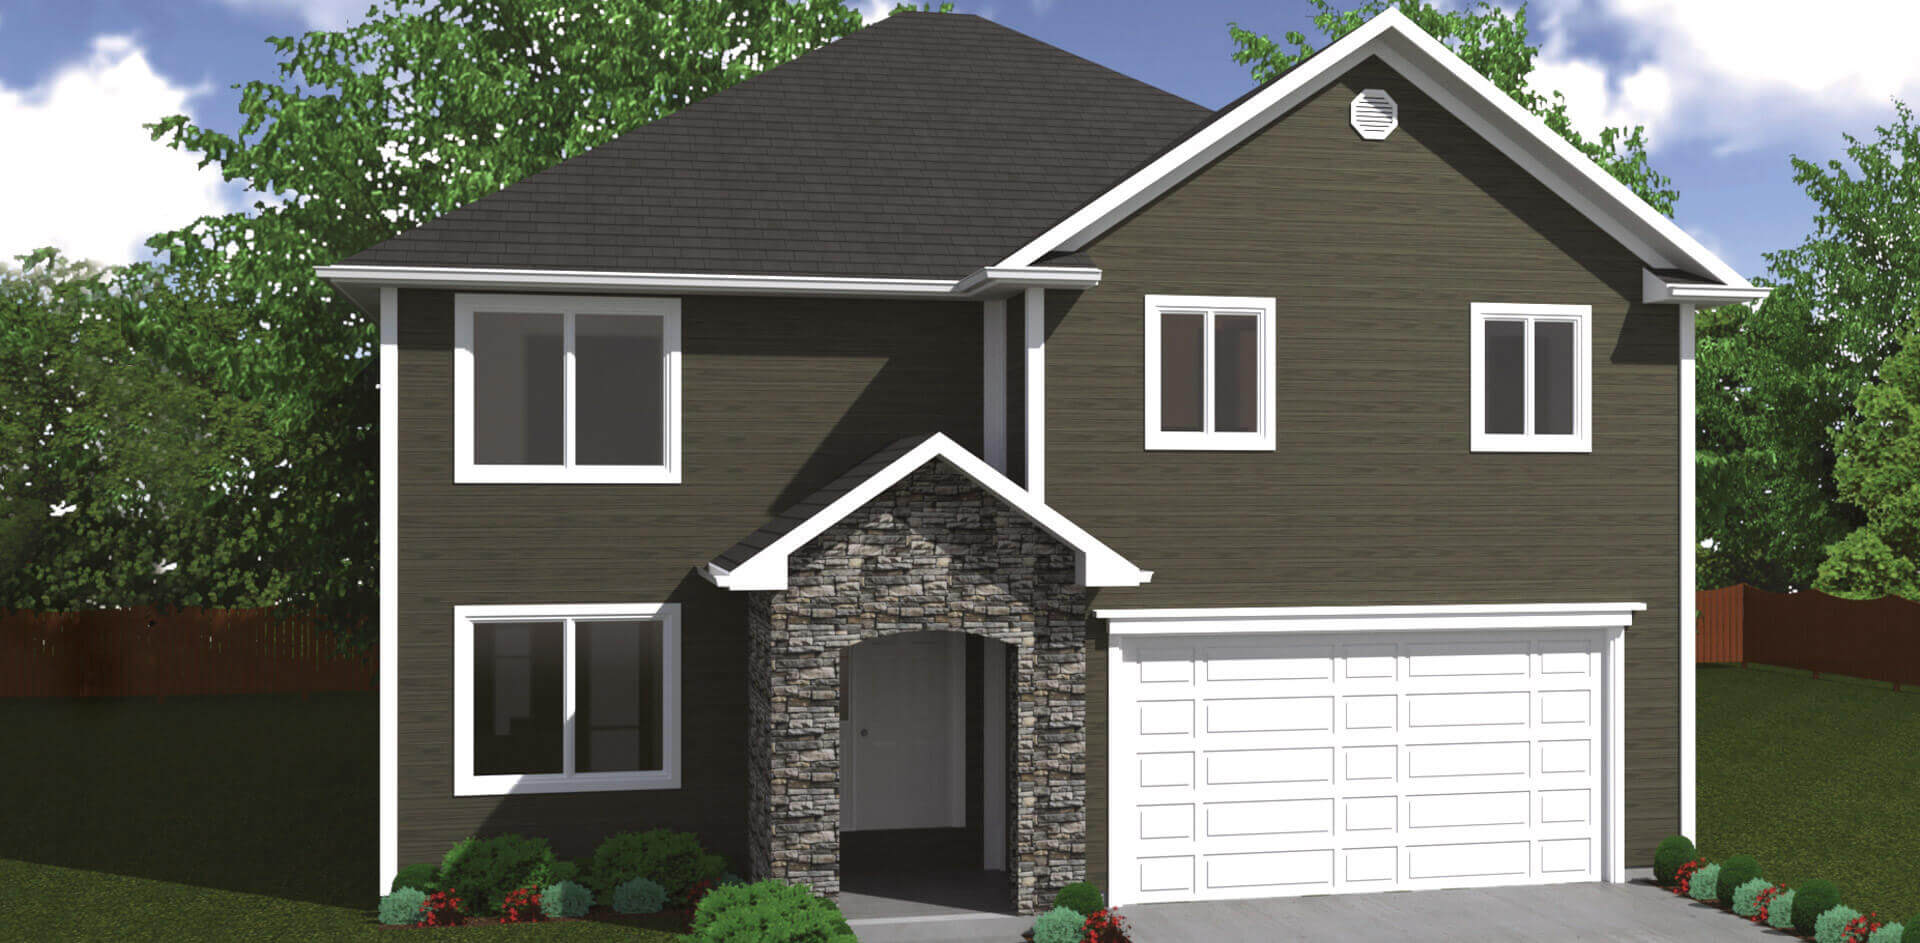 2774 house exterior